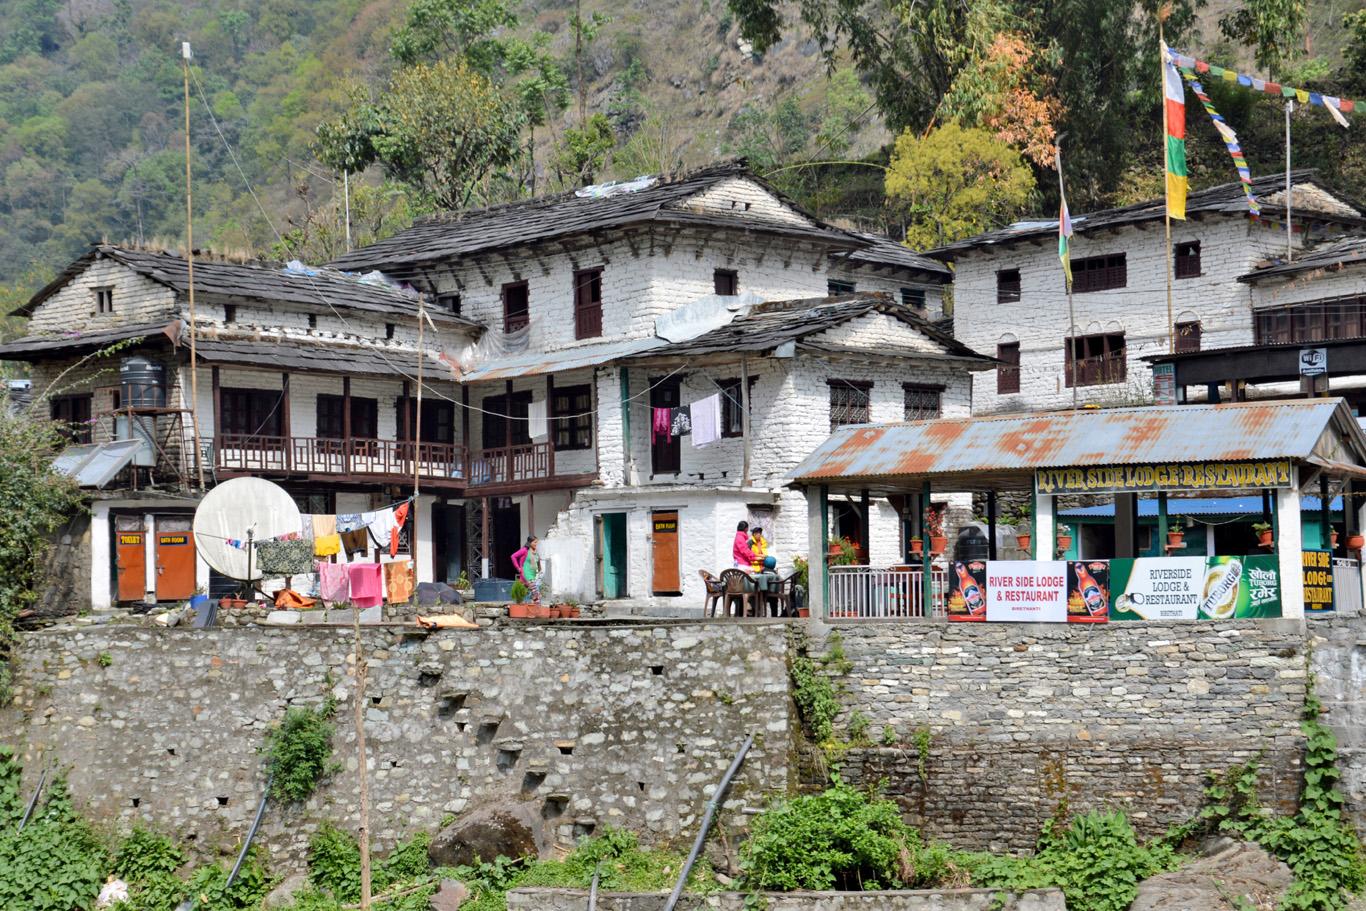 The village of Birethanti